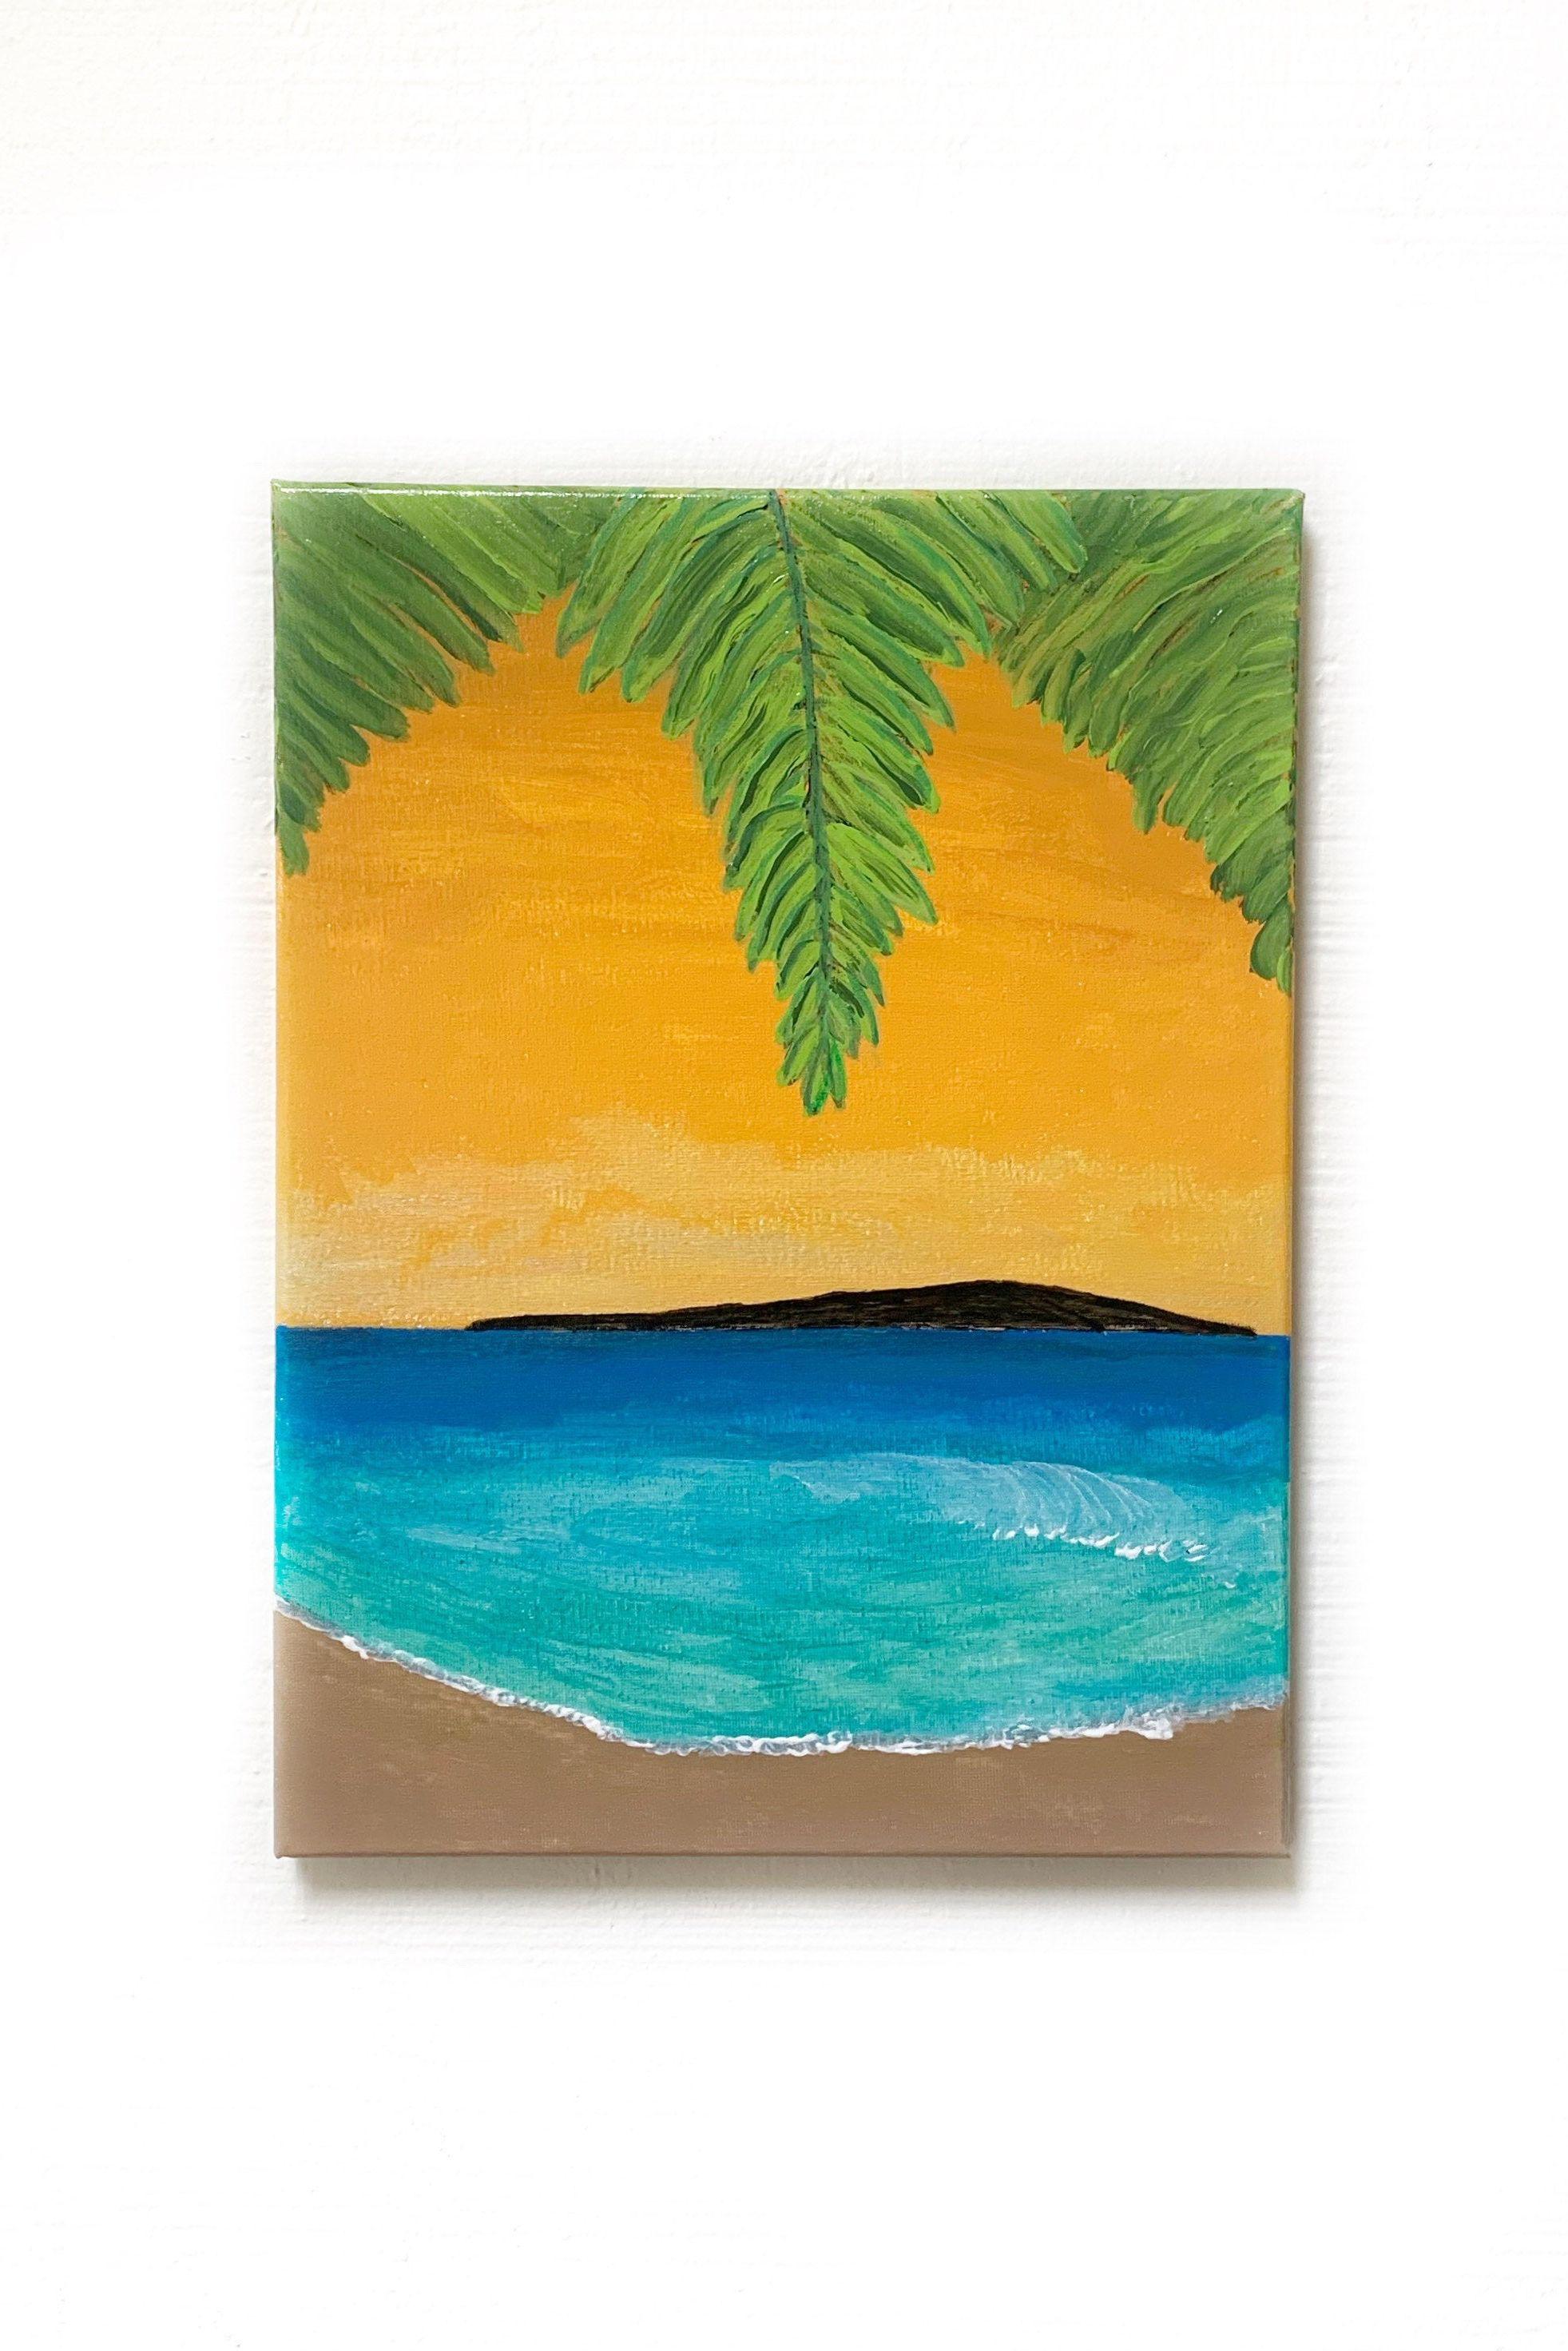 Majestic Makena Painting Surf Art Maui Art Coastal Wall Etsy In 2020 Surf Art Cute Canvas Paintings Painting